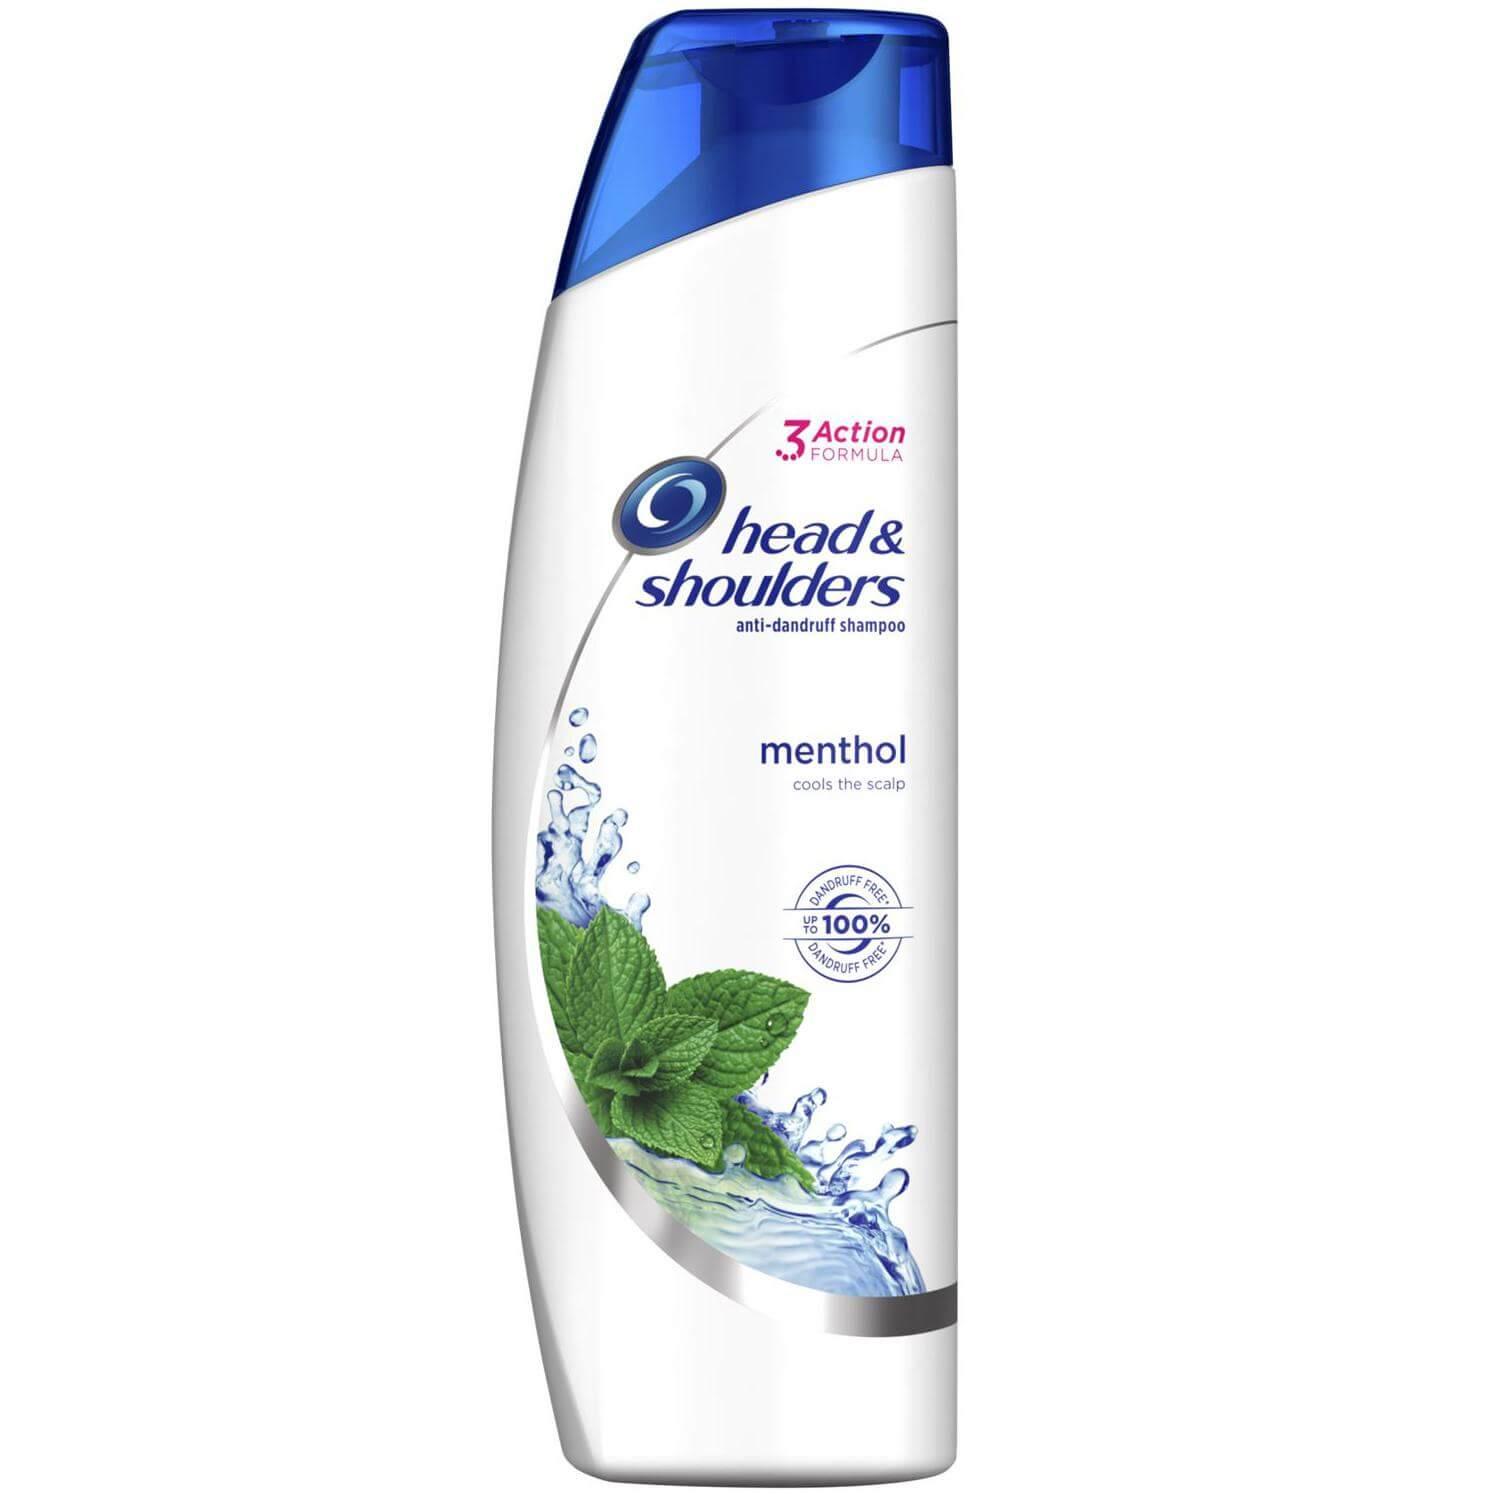 Head & Shoulders Anti-Dandruff Cool Menthol Shampoo Σαμπουάν Κατά της Πιτυρίδας με Μενθόλη για Φυσική Αίσθηση Δροσιάς 225ml